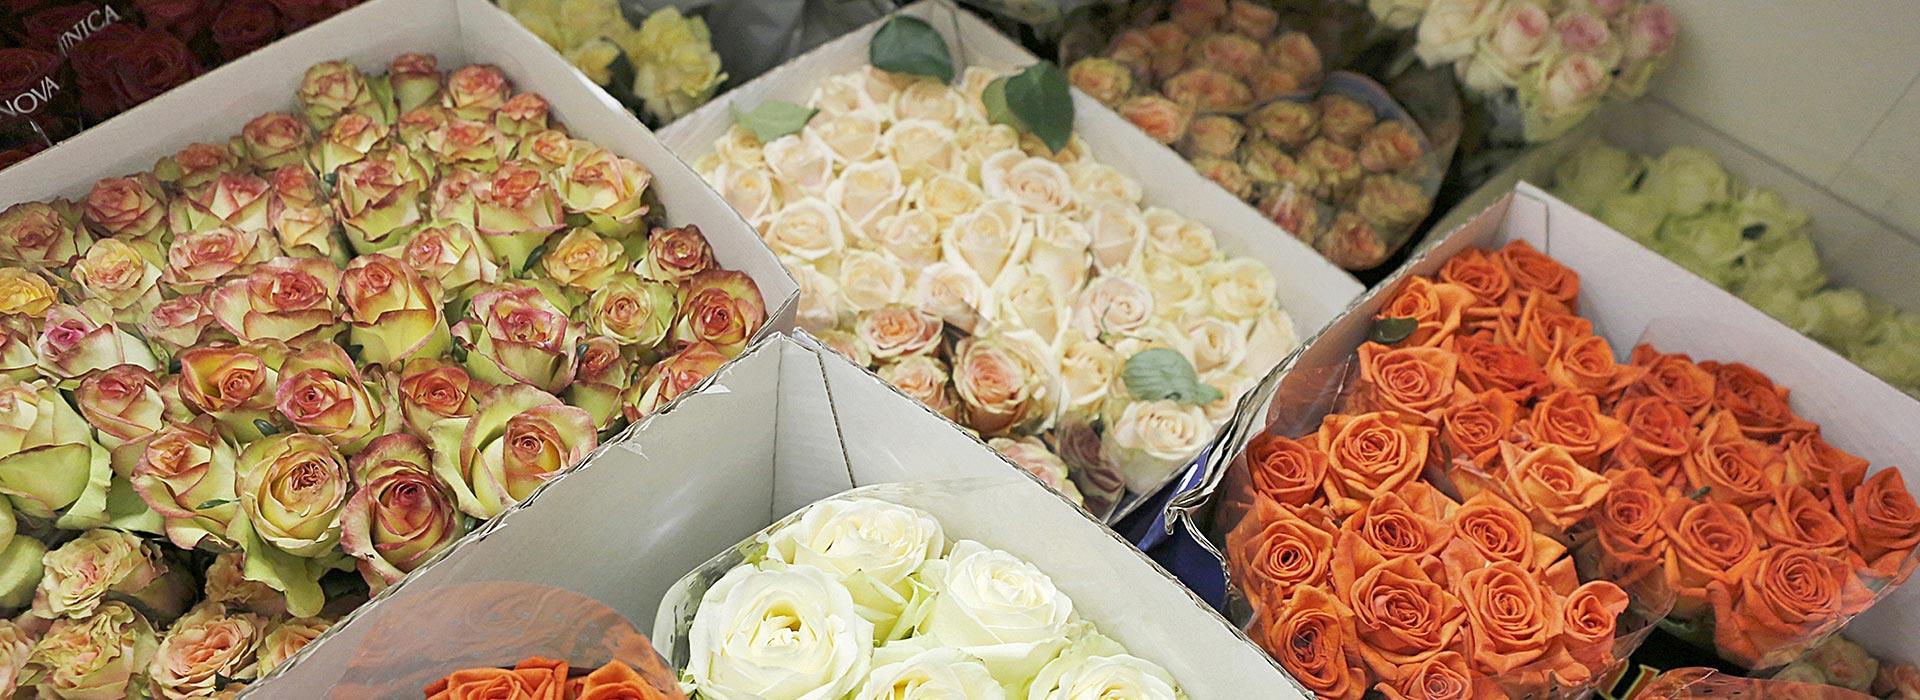 hero-bloemenwinkel-bloemenberg-02